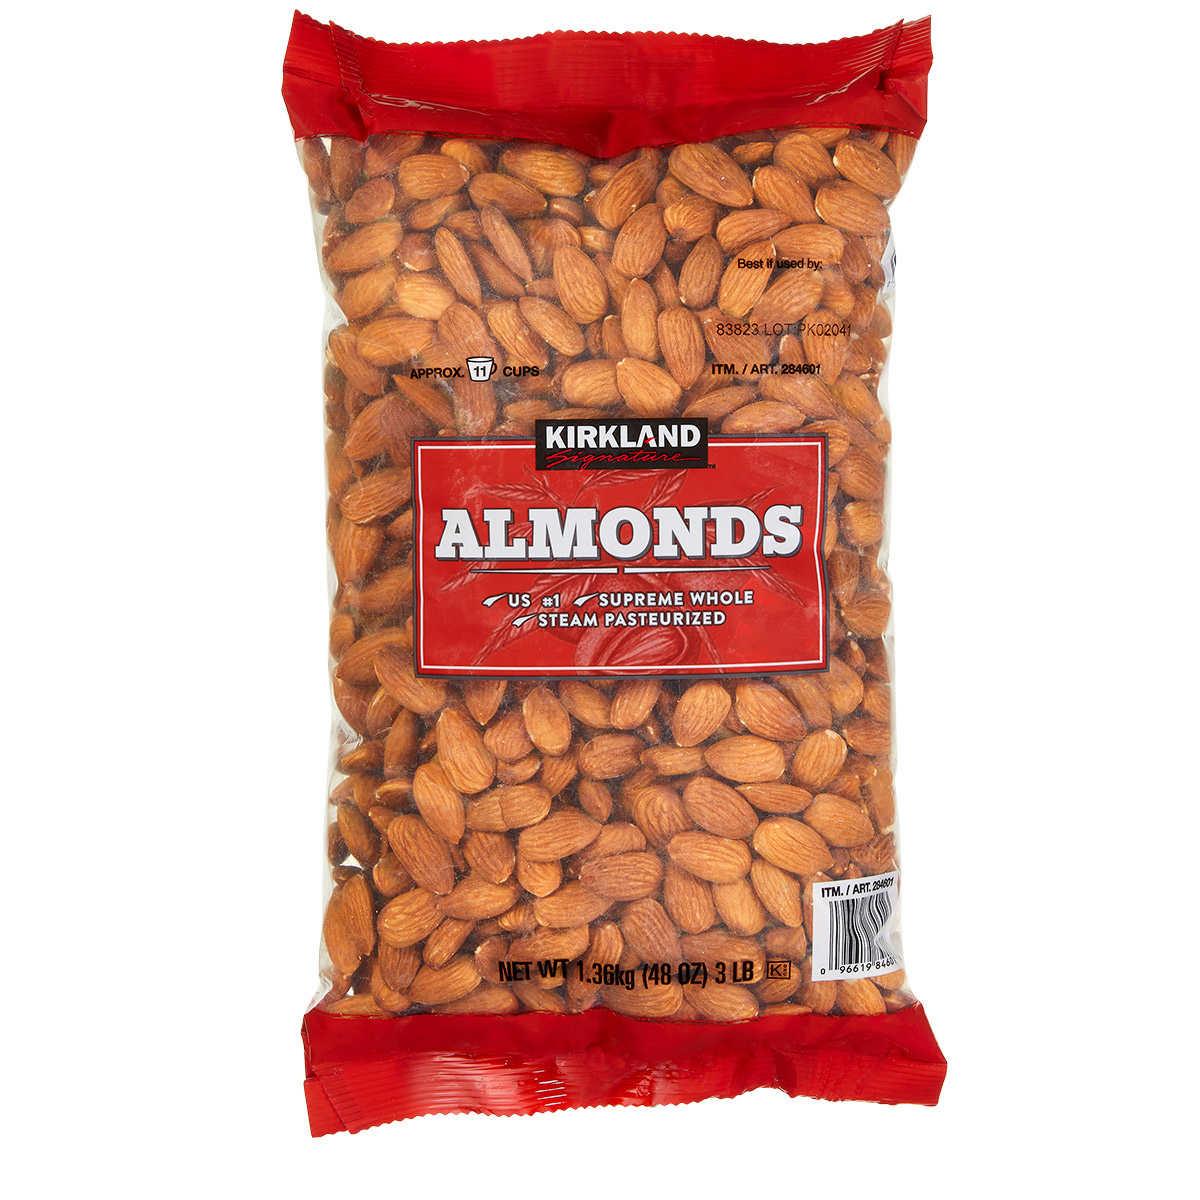 4a74b60b3bb Kirkland Signature Supreme Whole Almonds